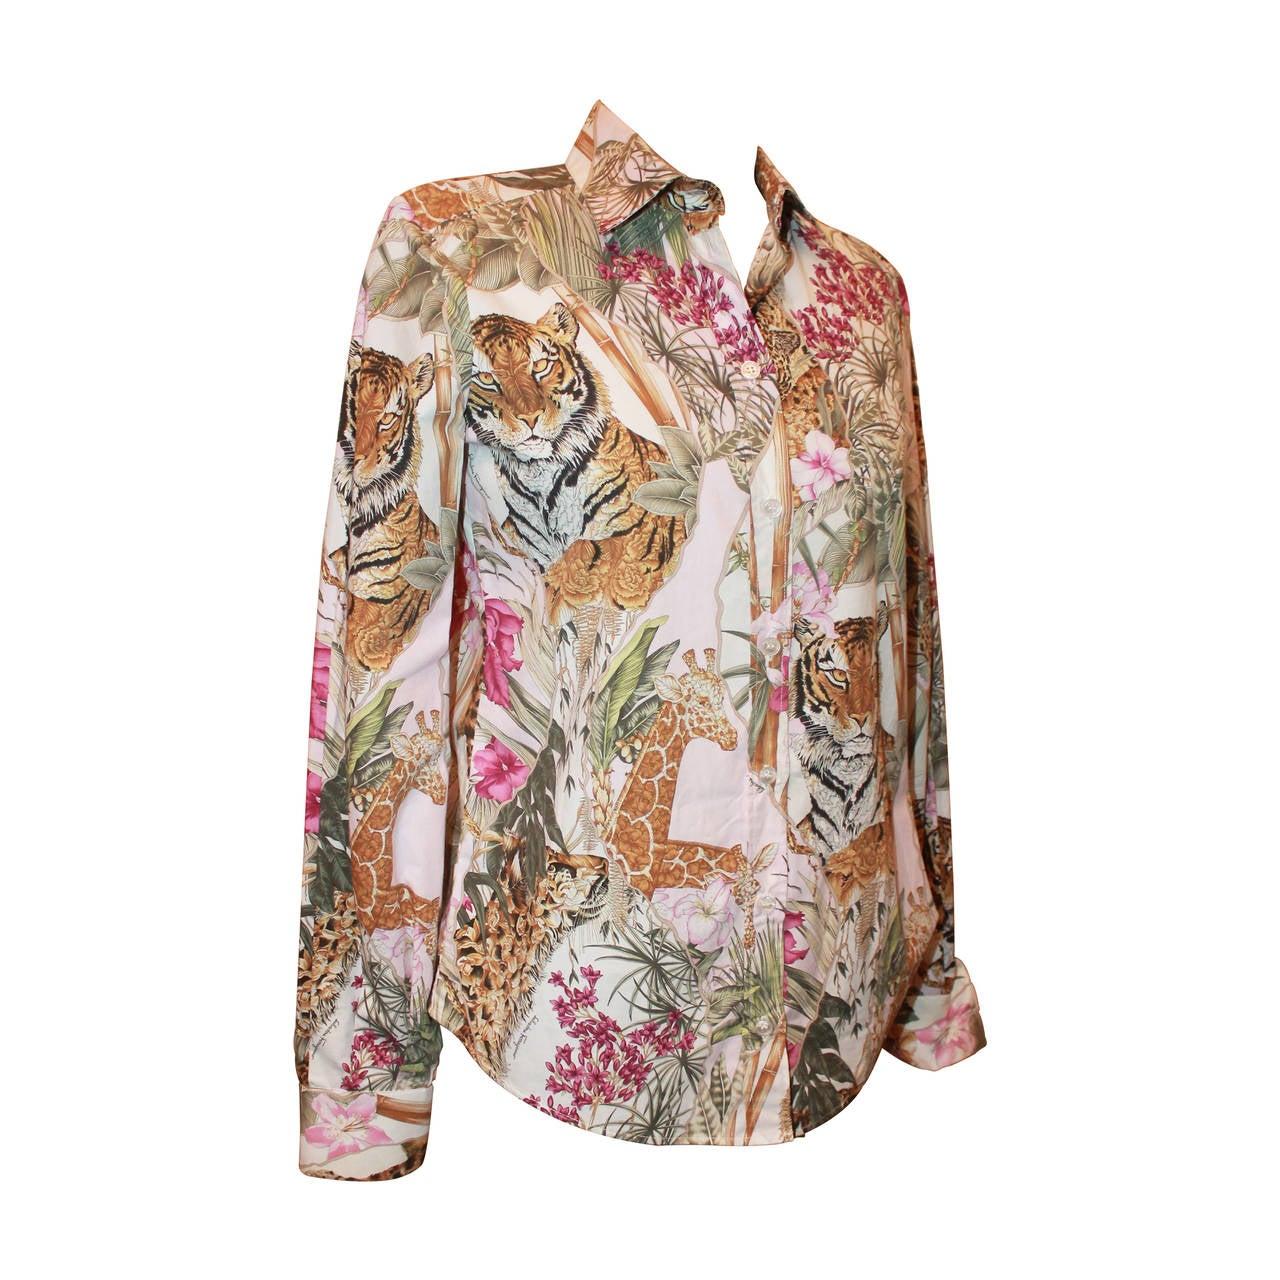 Salvatore Ferragamo Multi Color Jungle Print Long Sleeve Shirt - 40 1